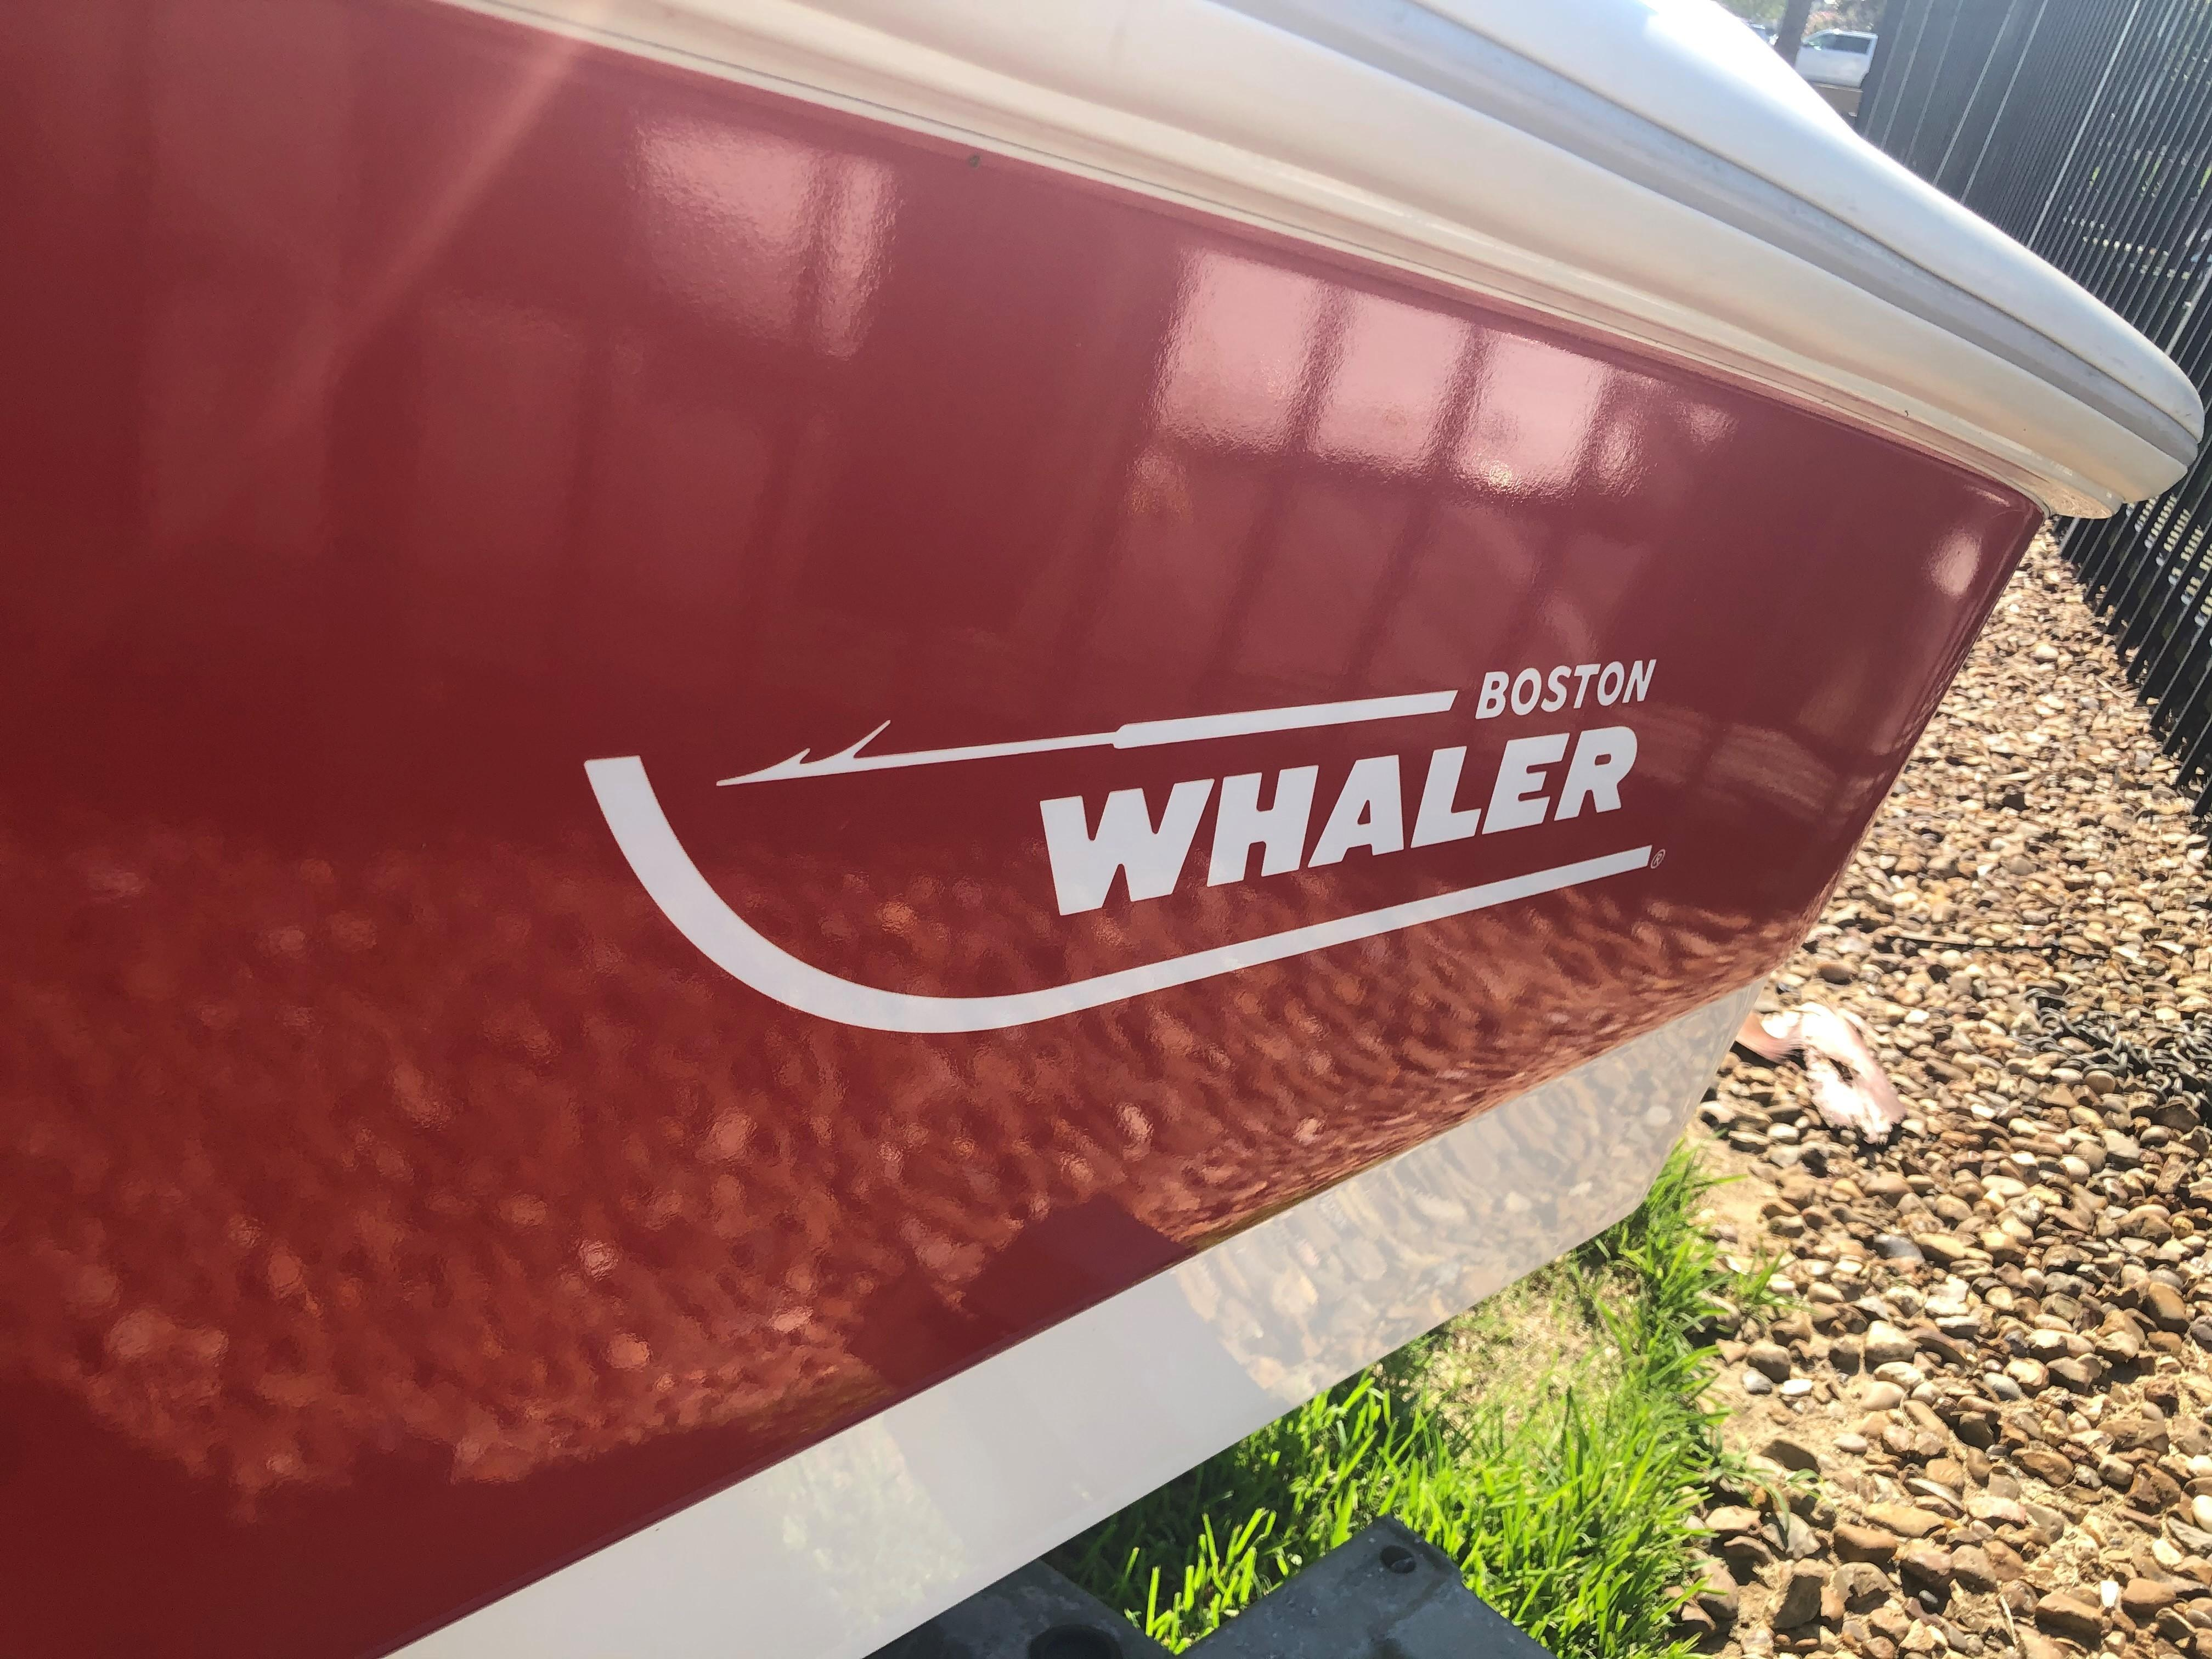 2015 Boston Whaler                                                              170 Super Sport Image Thumbnail #1